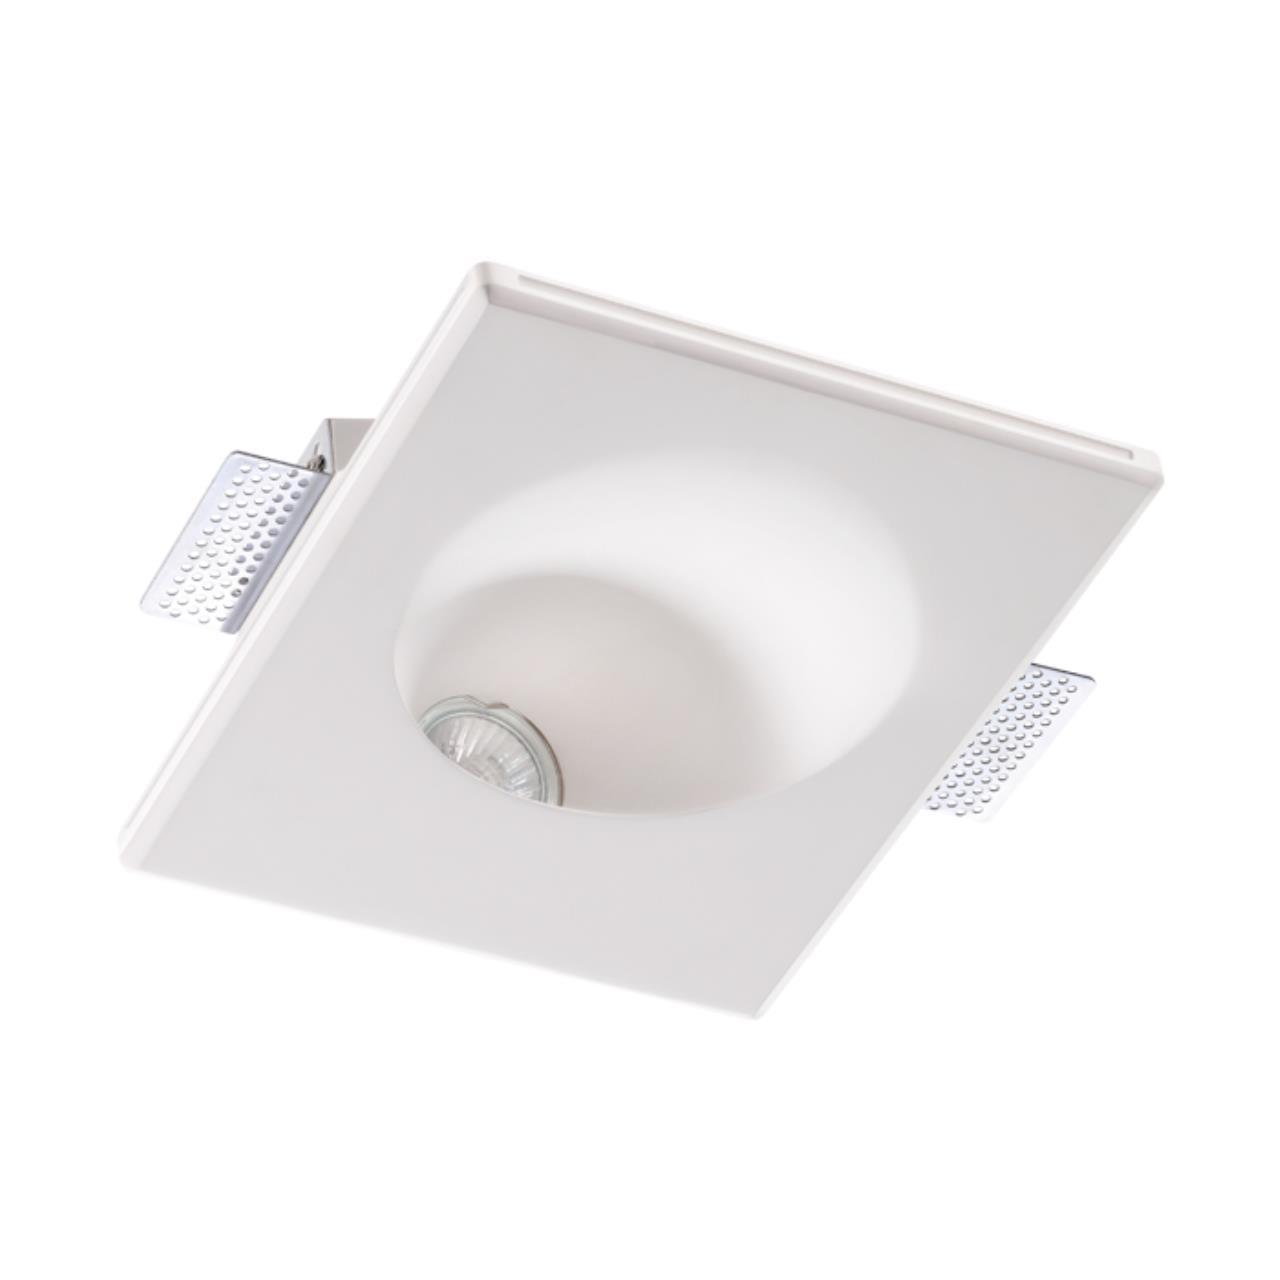 370497 SPOT NT19 041 белый Встраиваемый в стену под покраску светильник IP20 LED 50W 220V CAIL